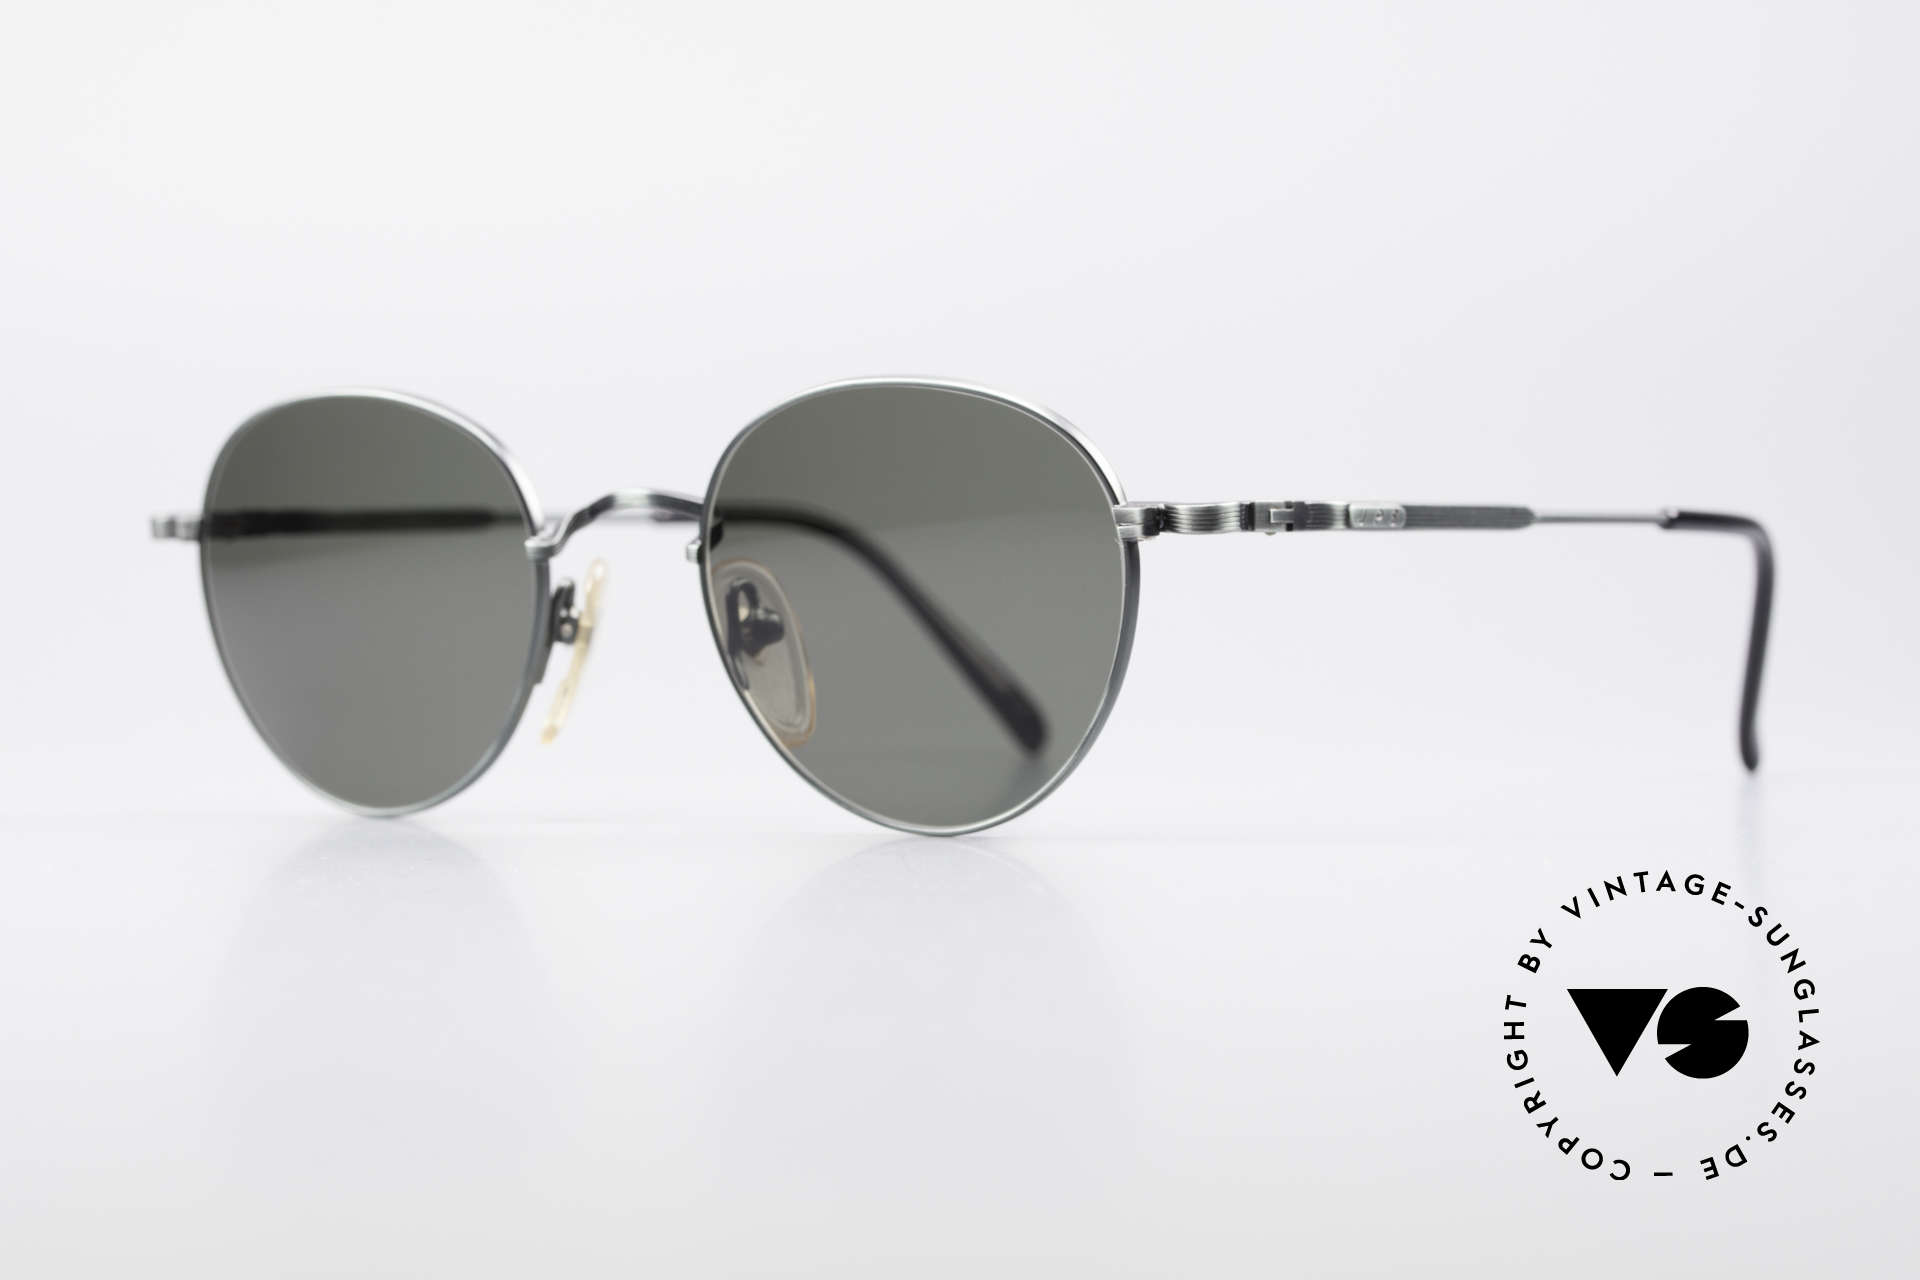 Jean Paul Gaultier 55-1174 Round Vintage Sunglasses, fir green frame with dark green sun lenses (100% UV), Made for Men and Women